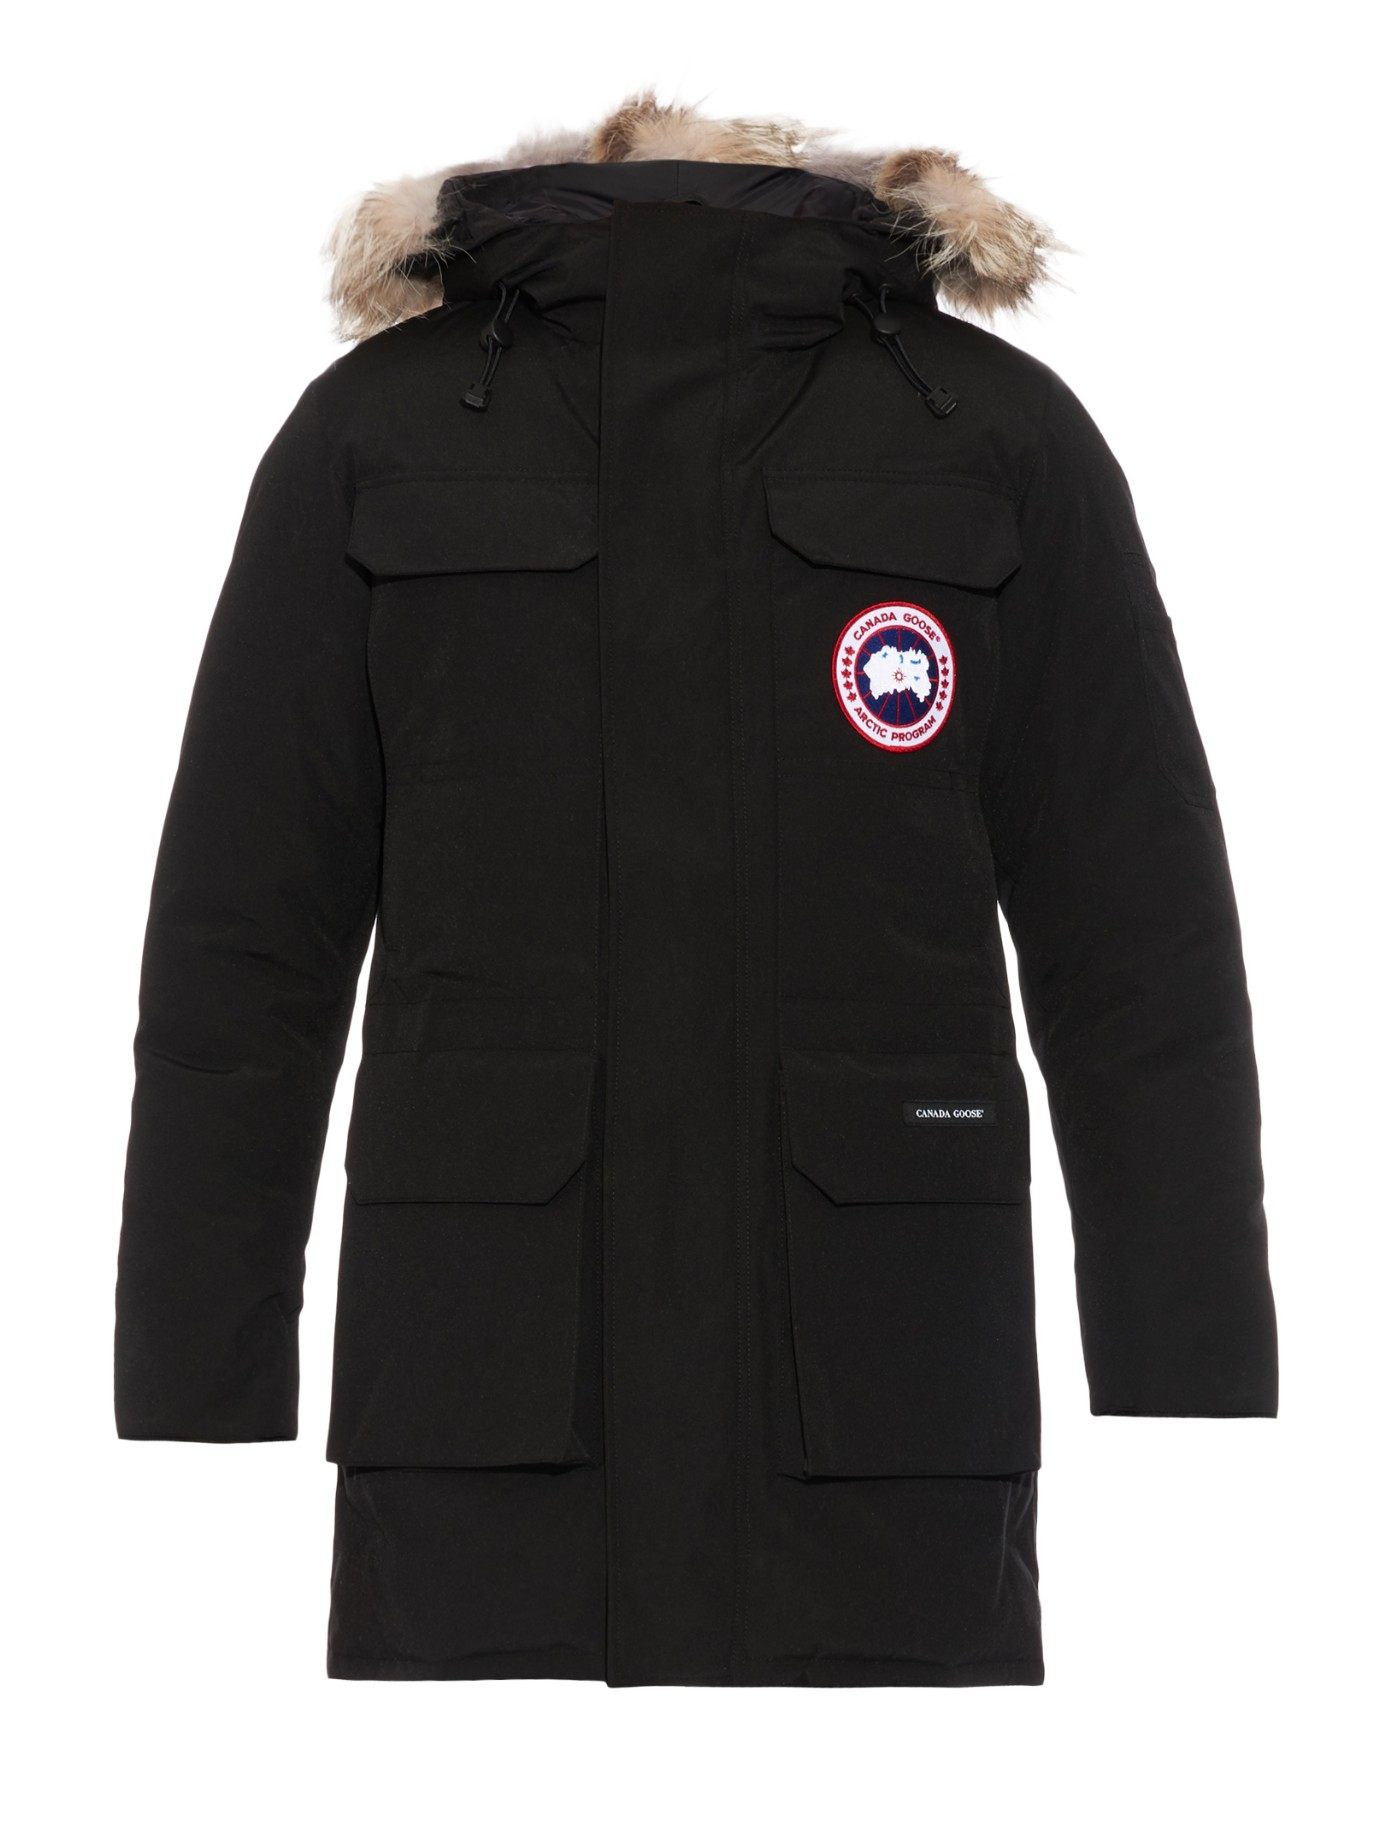 Canada Goose coats outlet authentic - Canada goose Citadel Fur-trimmed Down Parka in Black for Men | Lyst